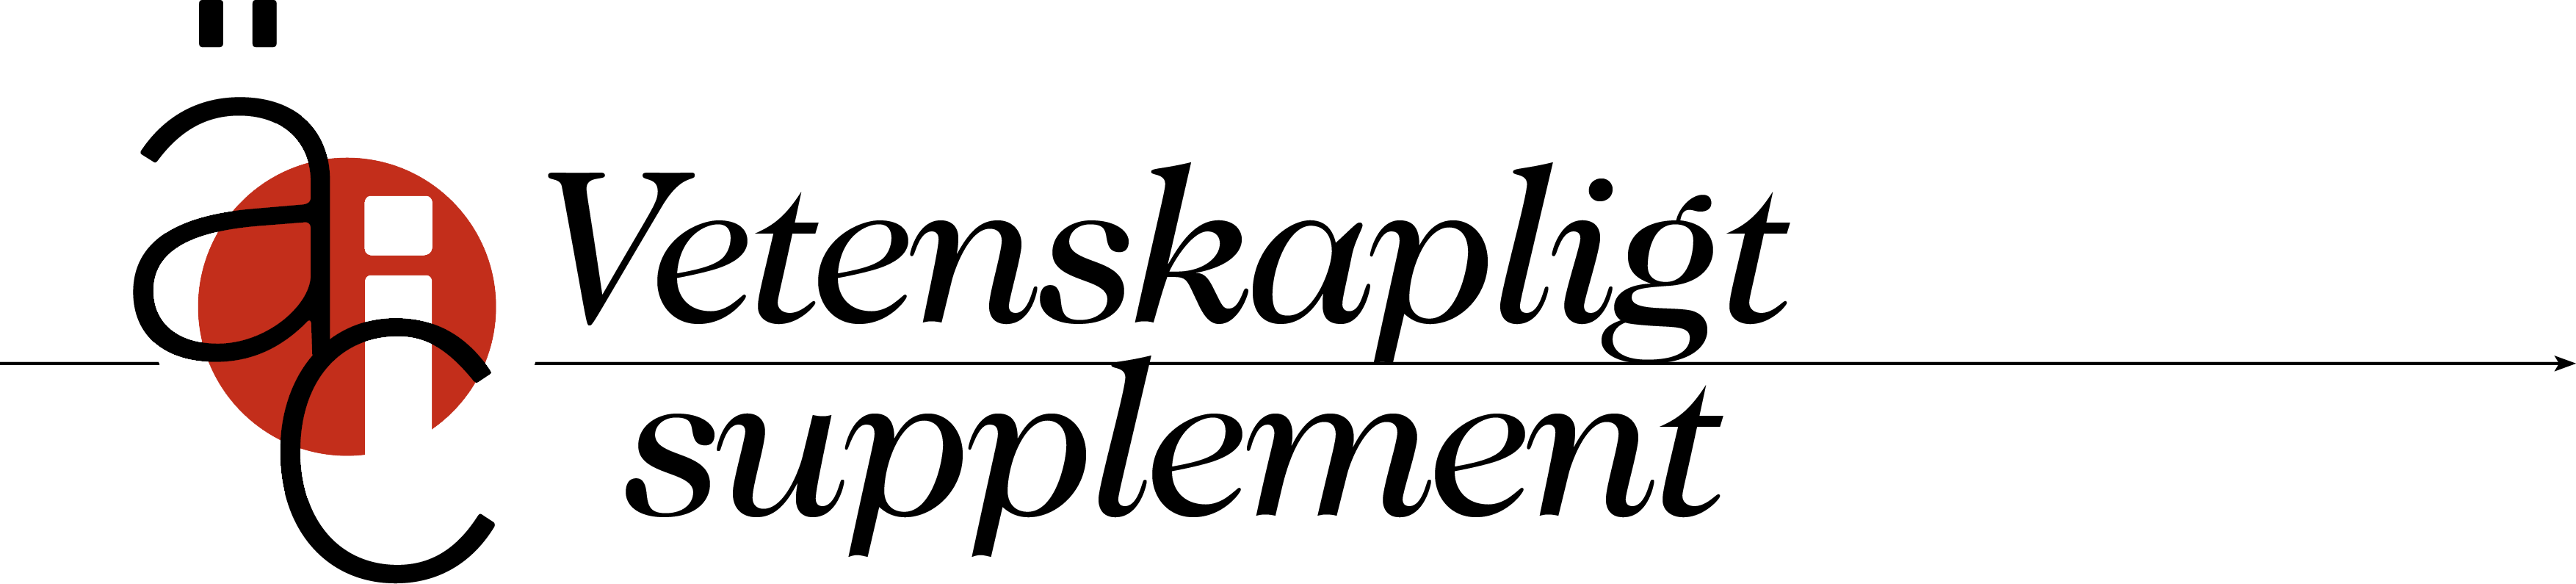 Logotyp ÄiC